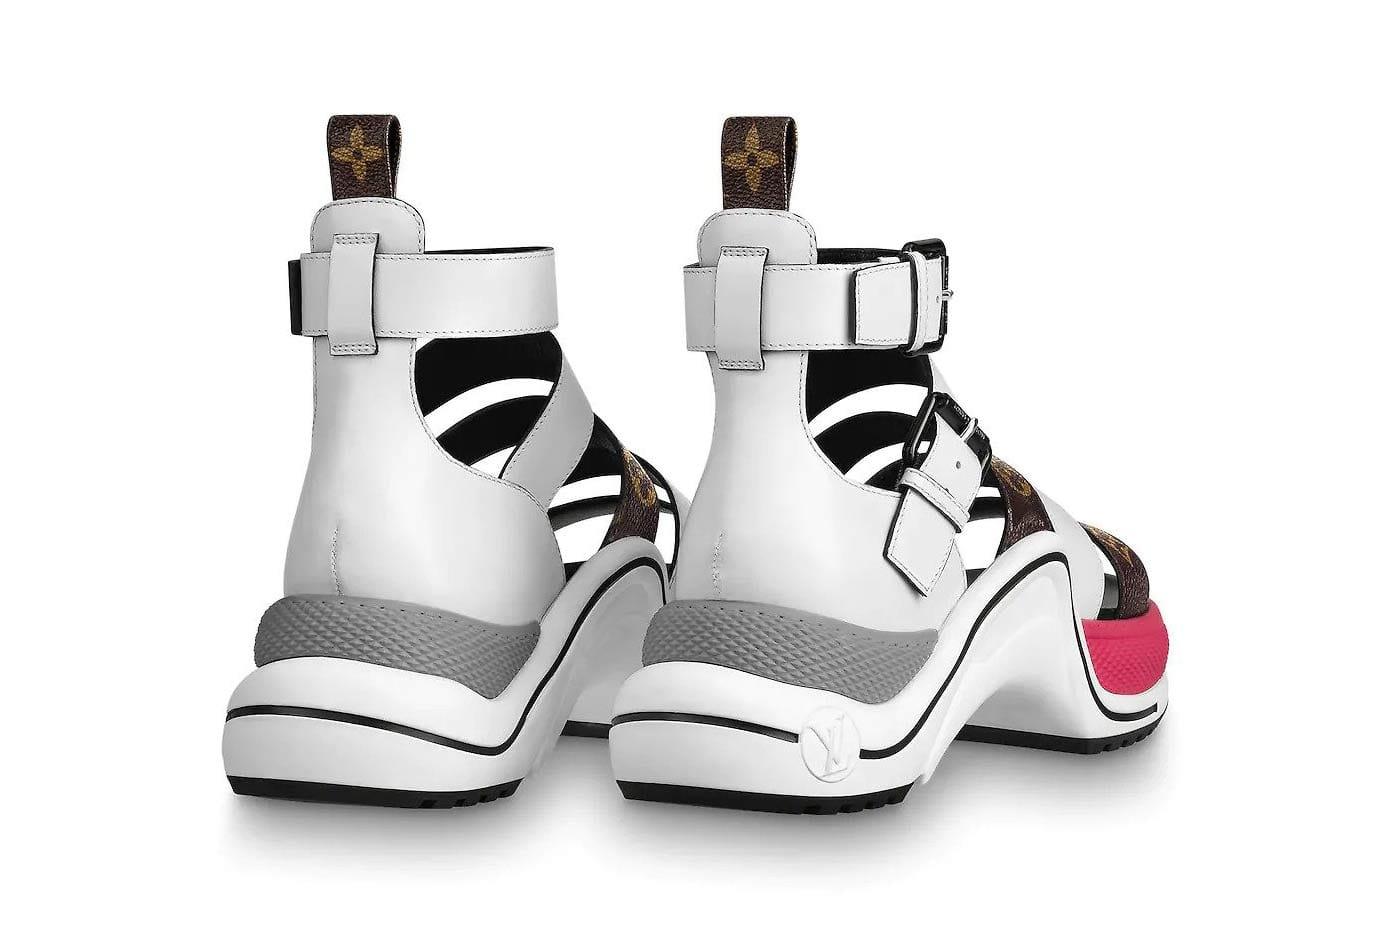 Louis Vuitton's Archlight Sandal White